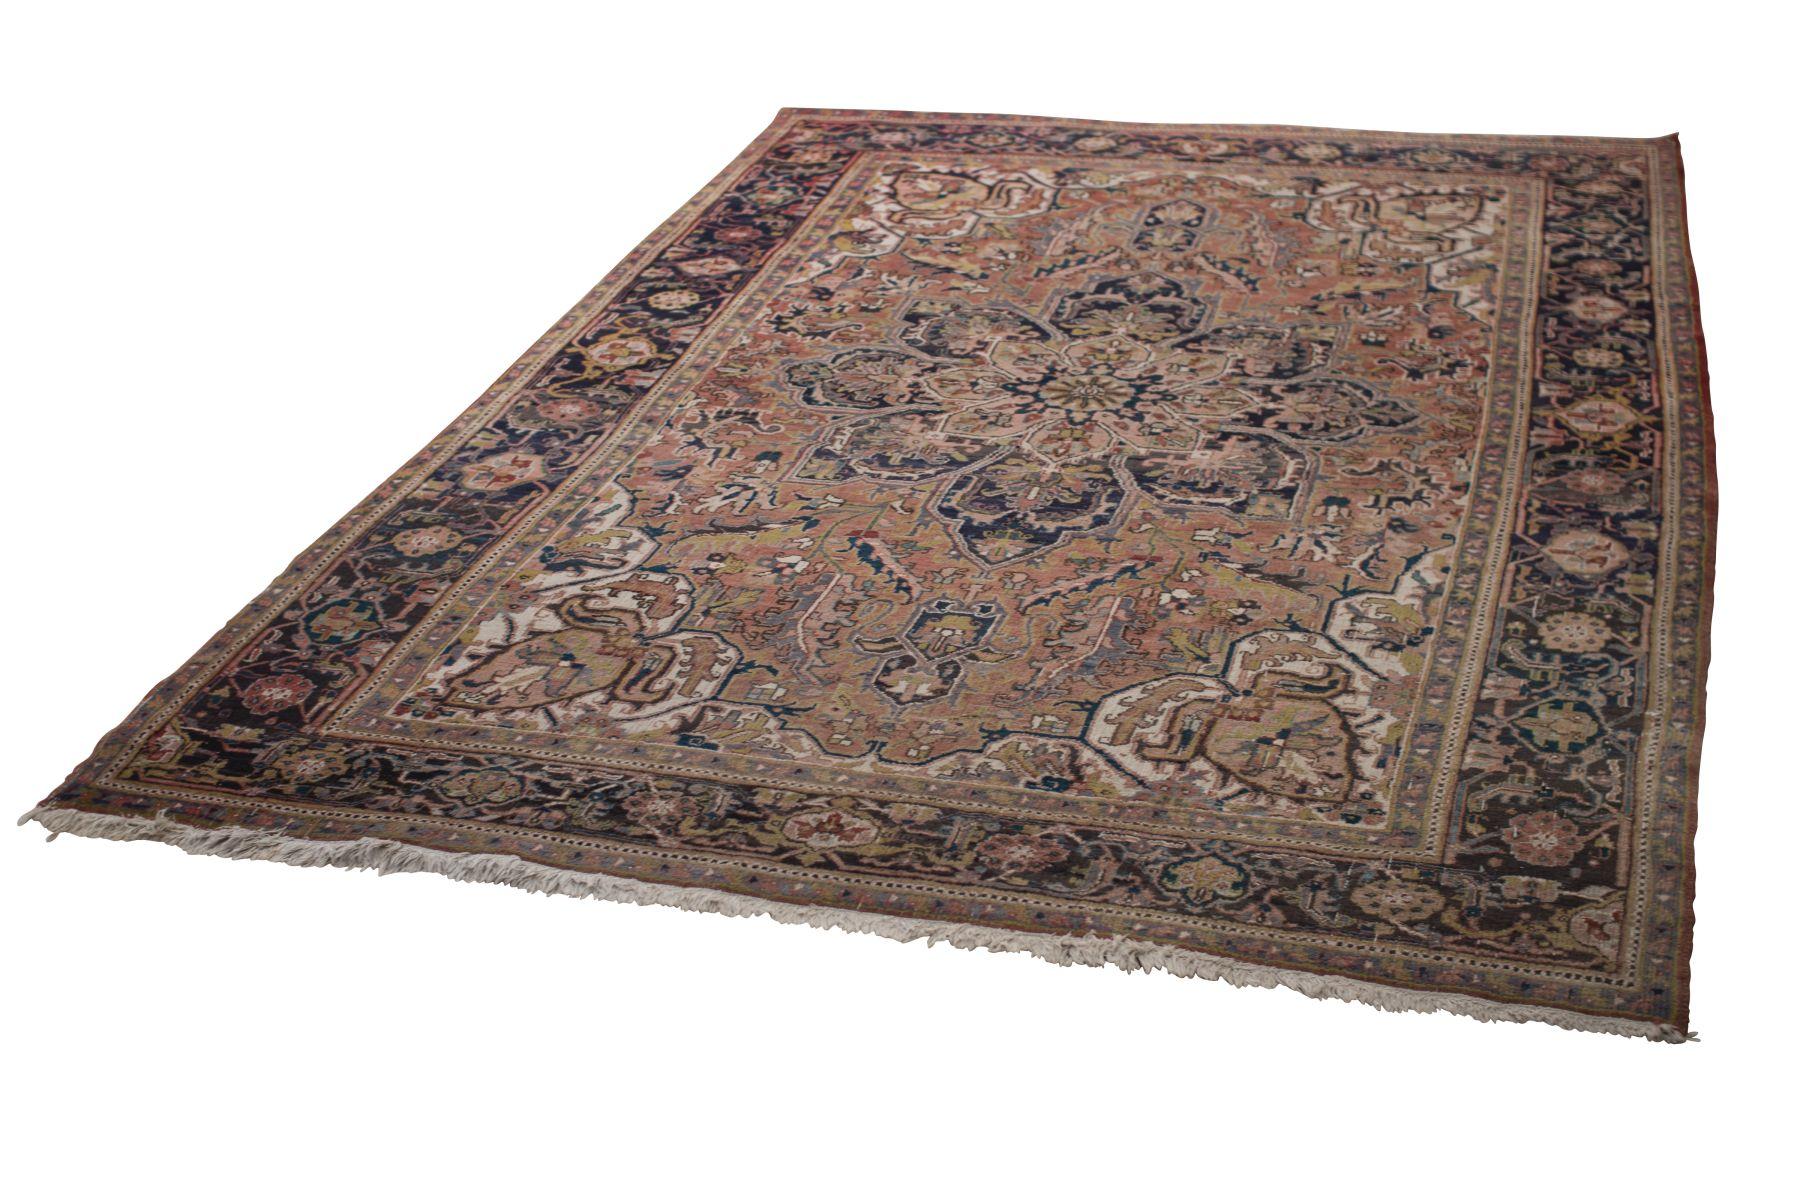 #75 Heriz carpet | Heriz Teppich Image